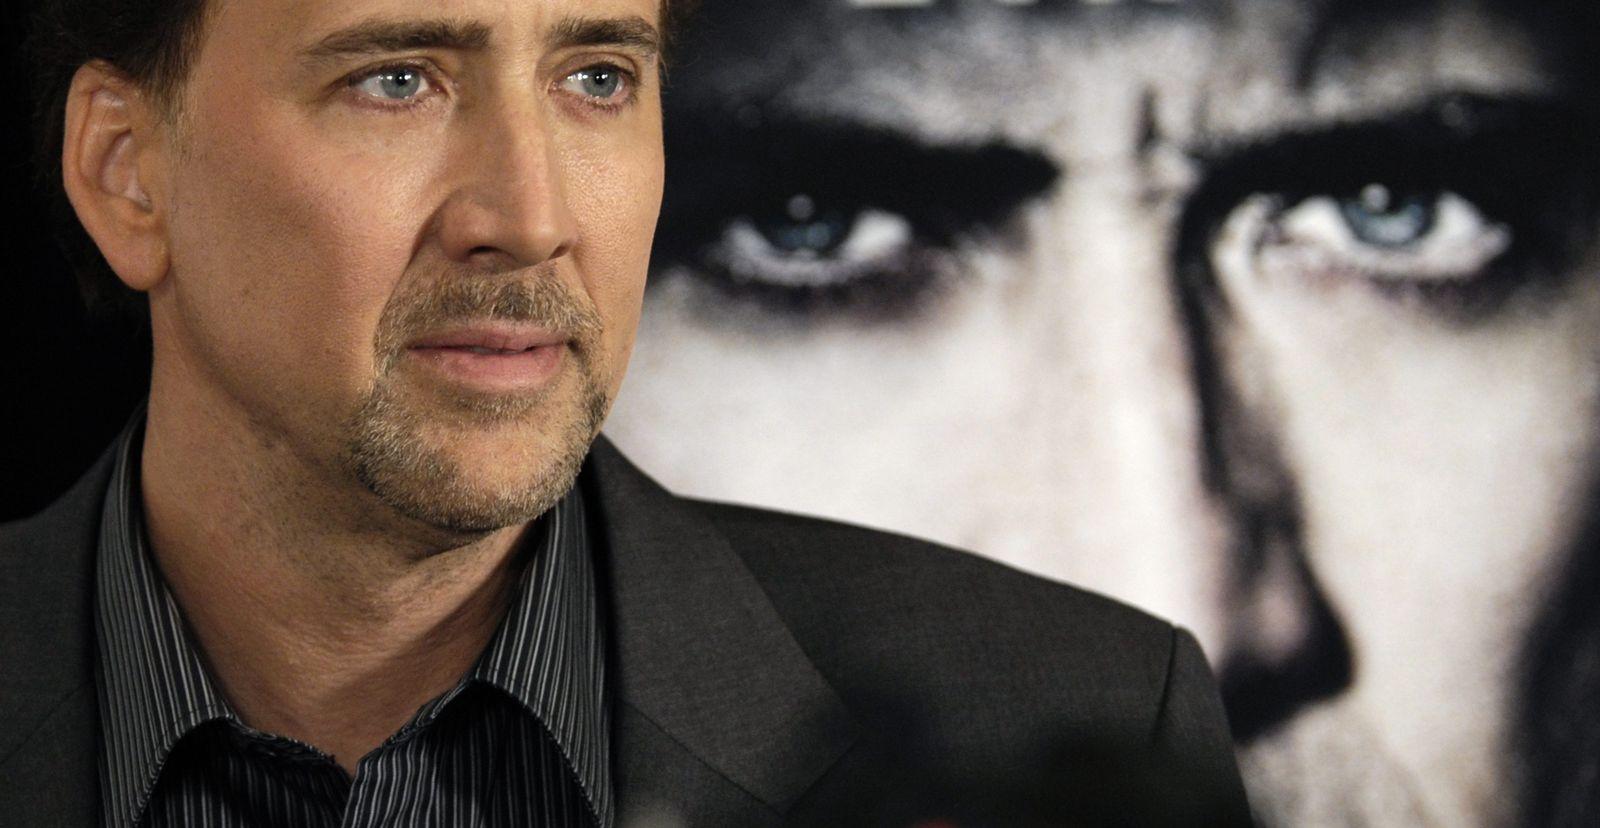 Nicolas Cage / Prominente / Schauspieler